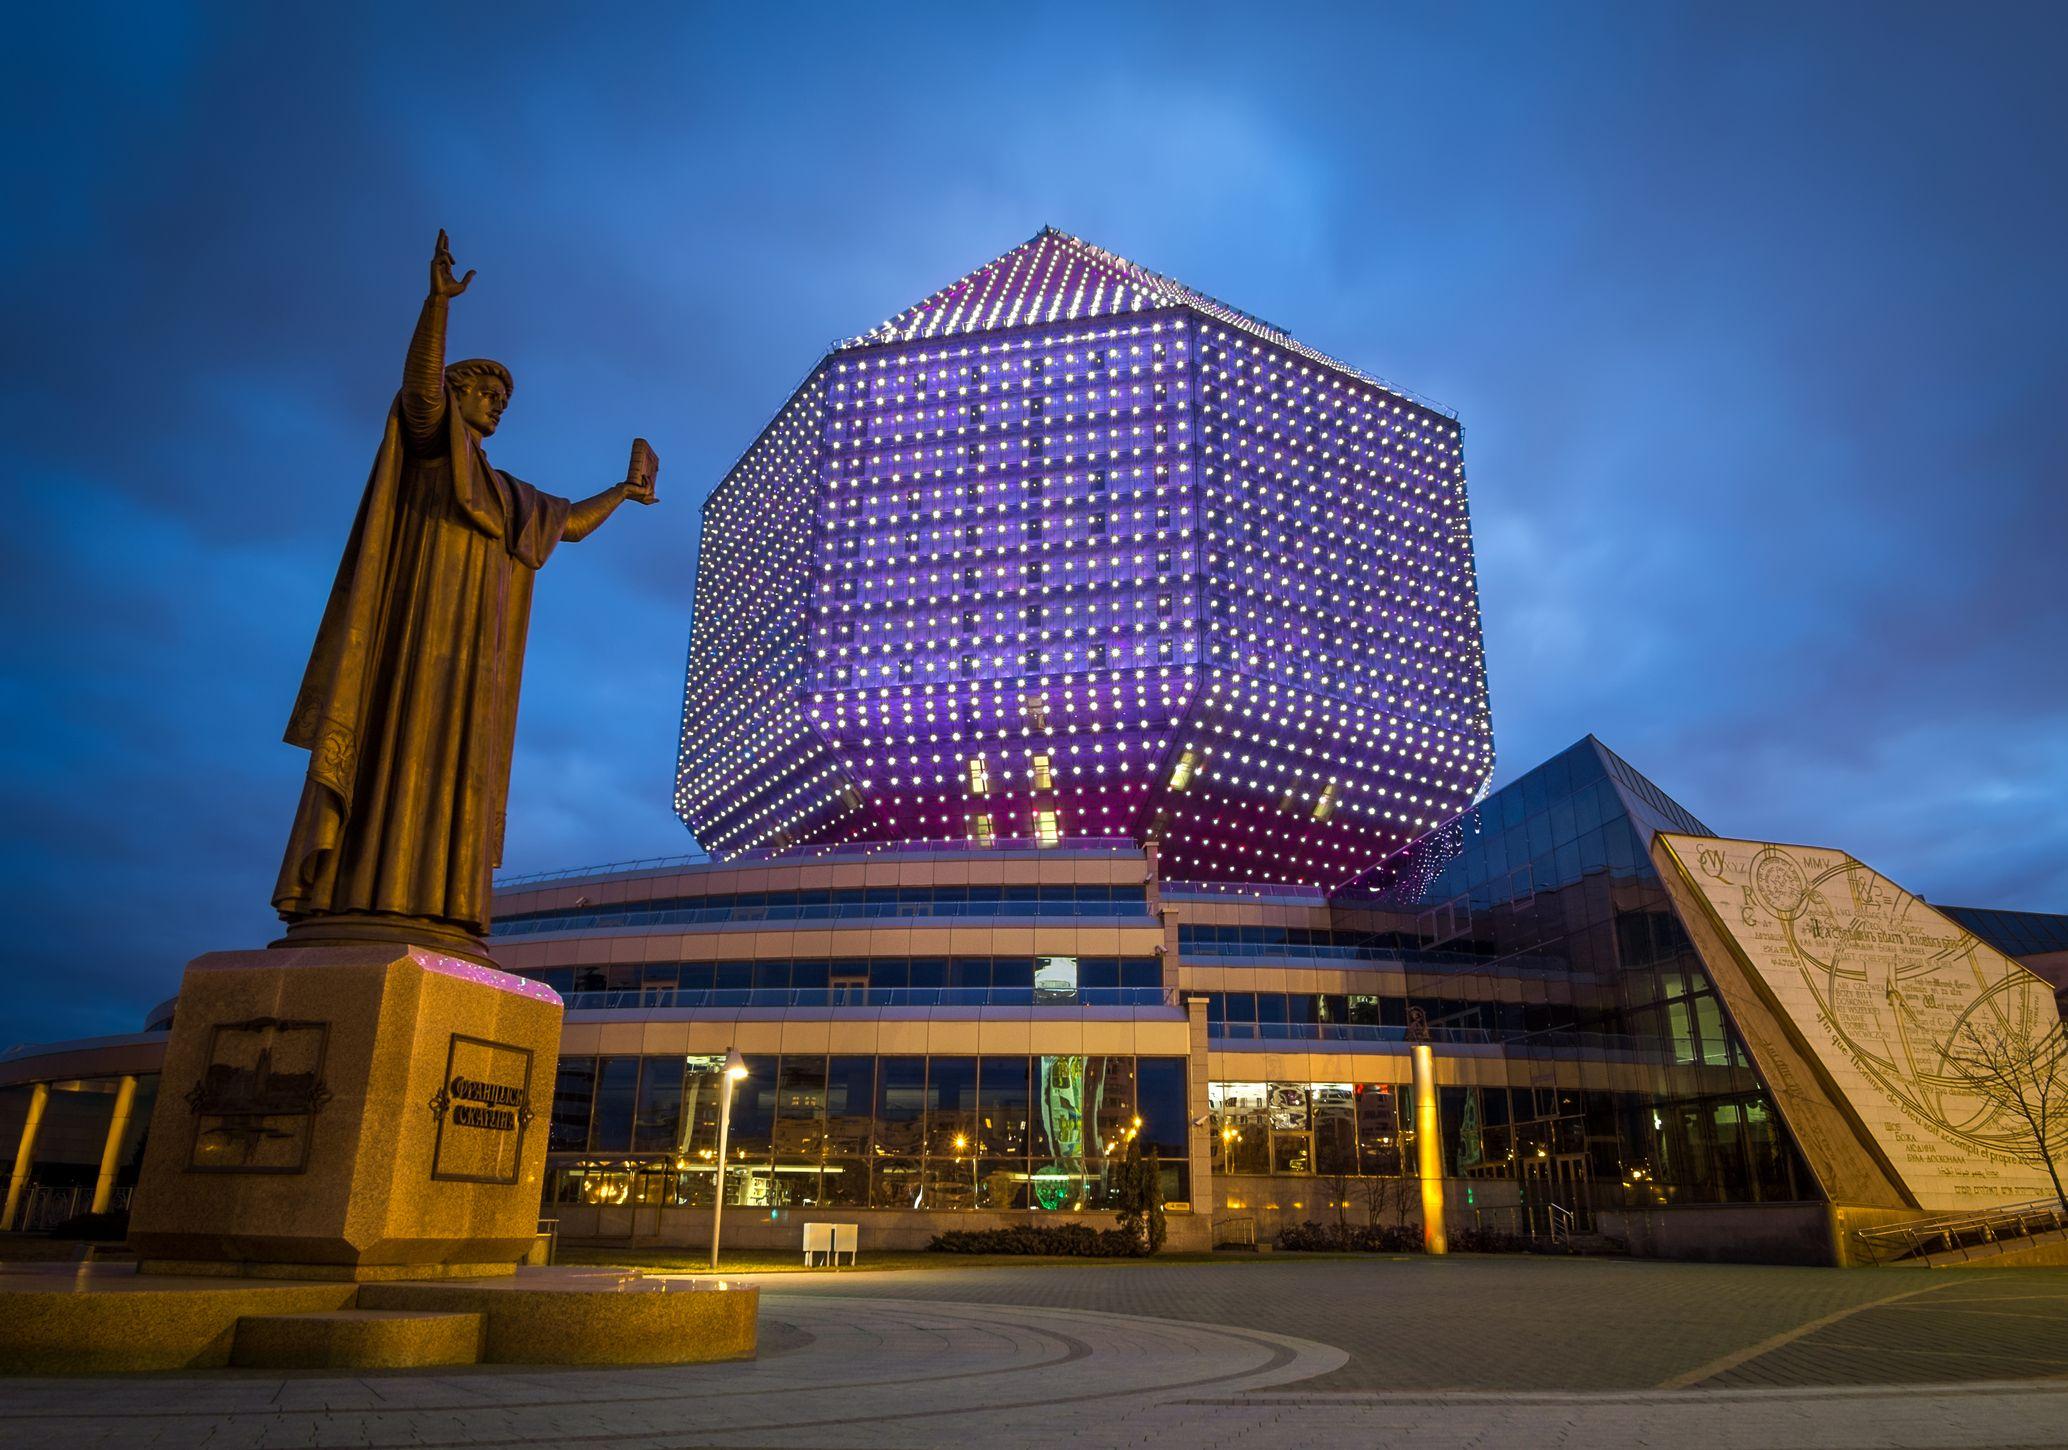 minskas-baltarusijos-nacionaline-bibliote-secret-world